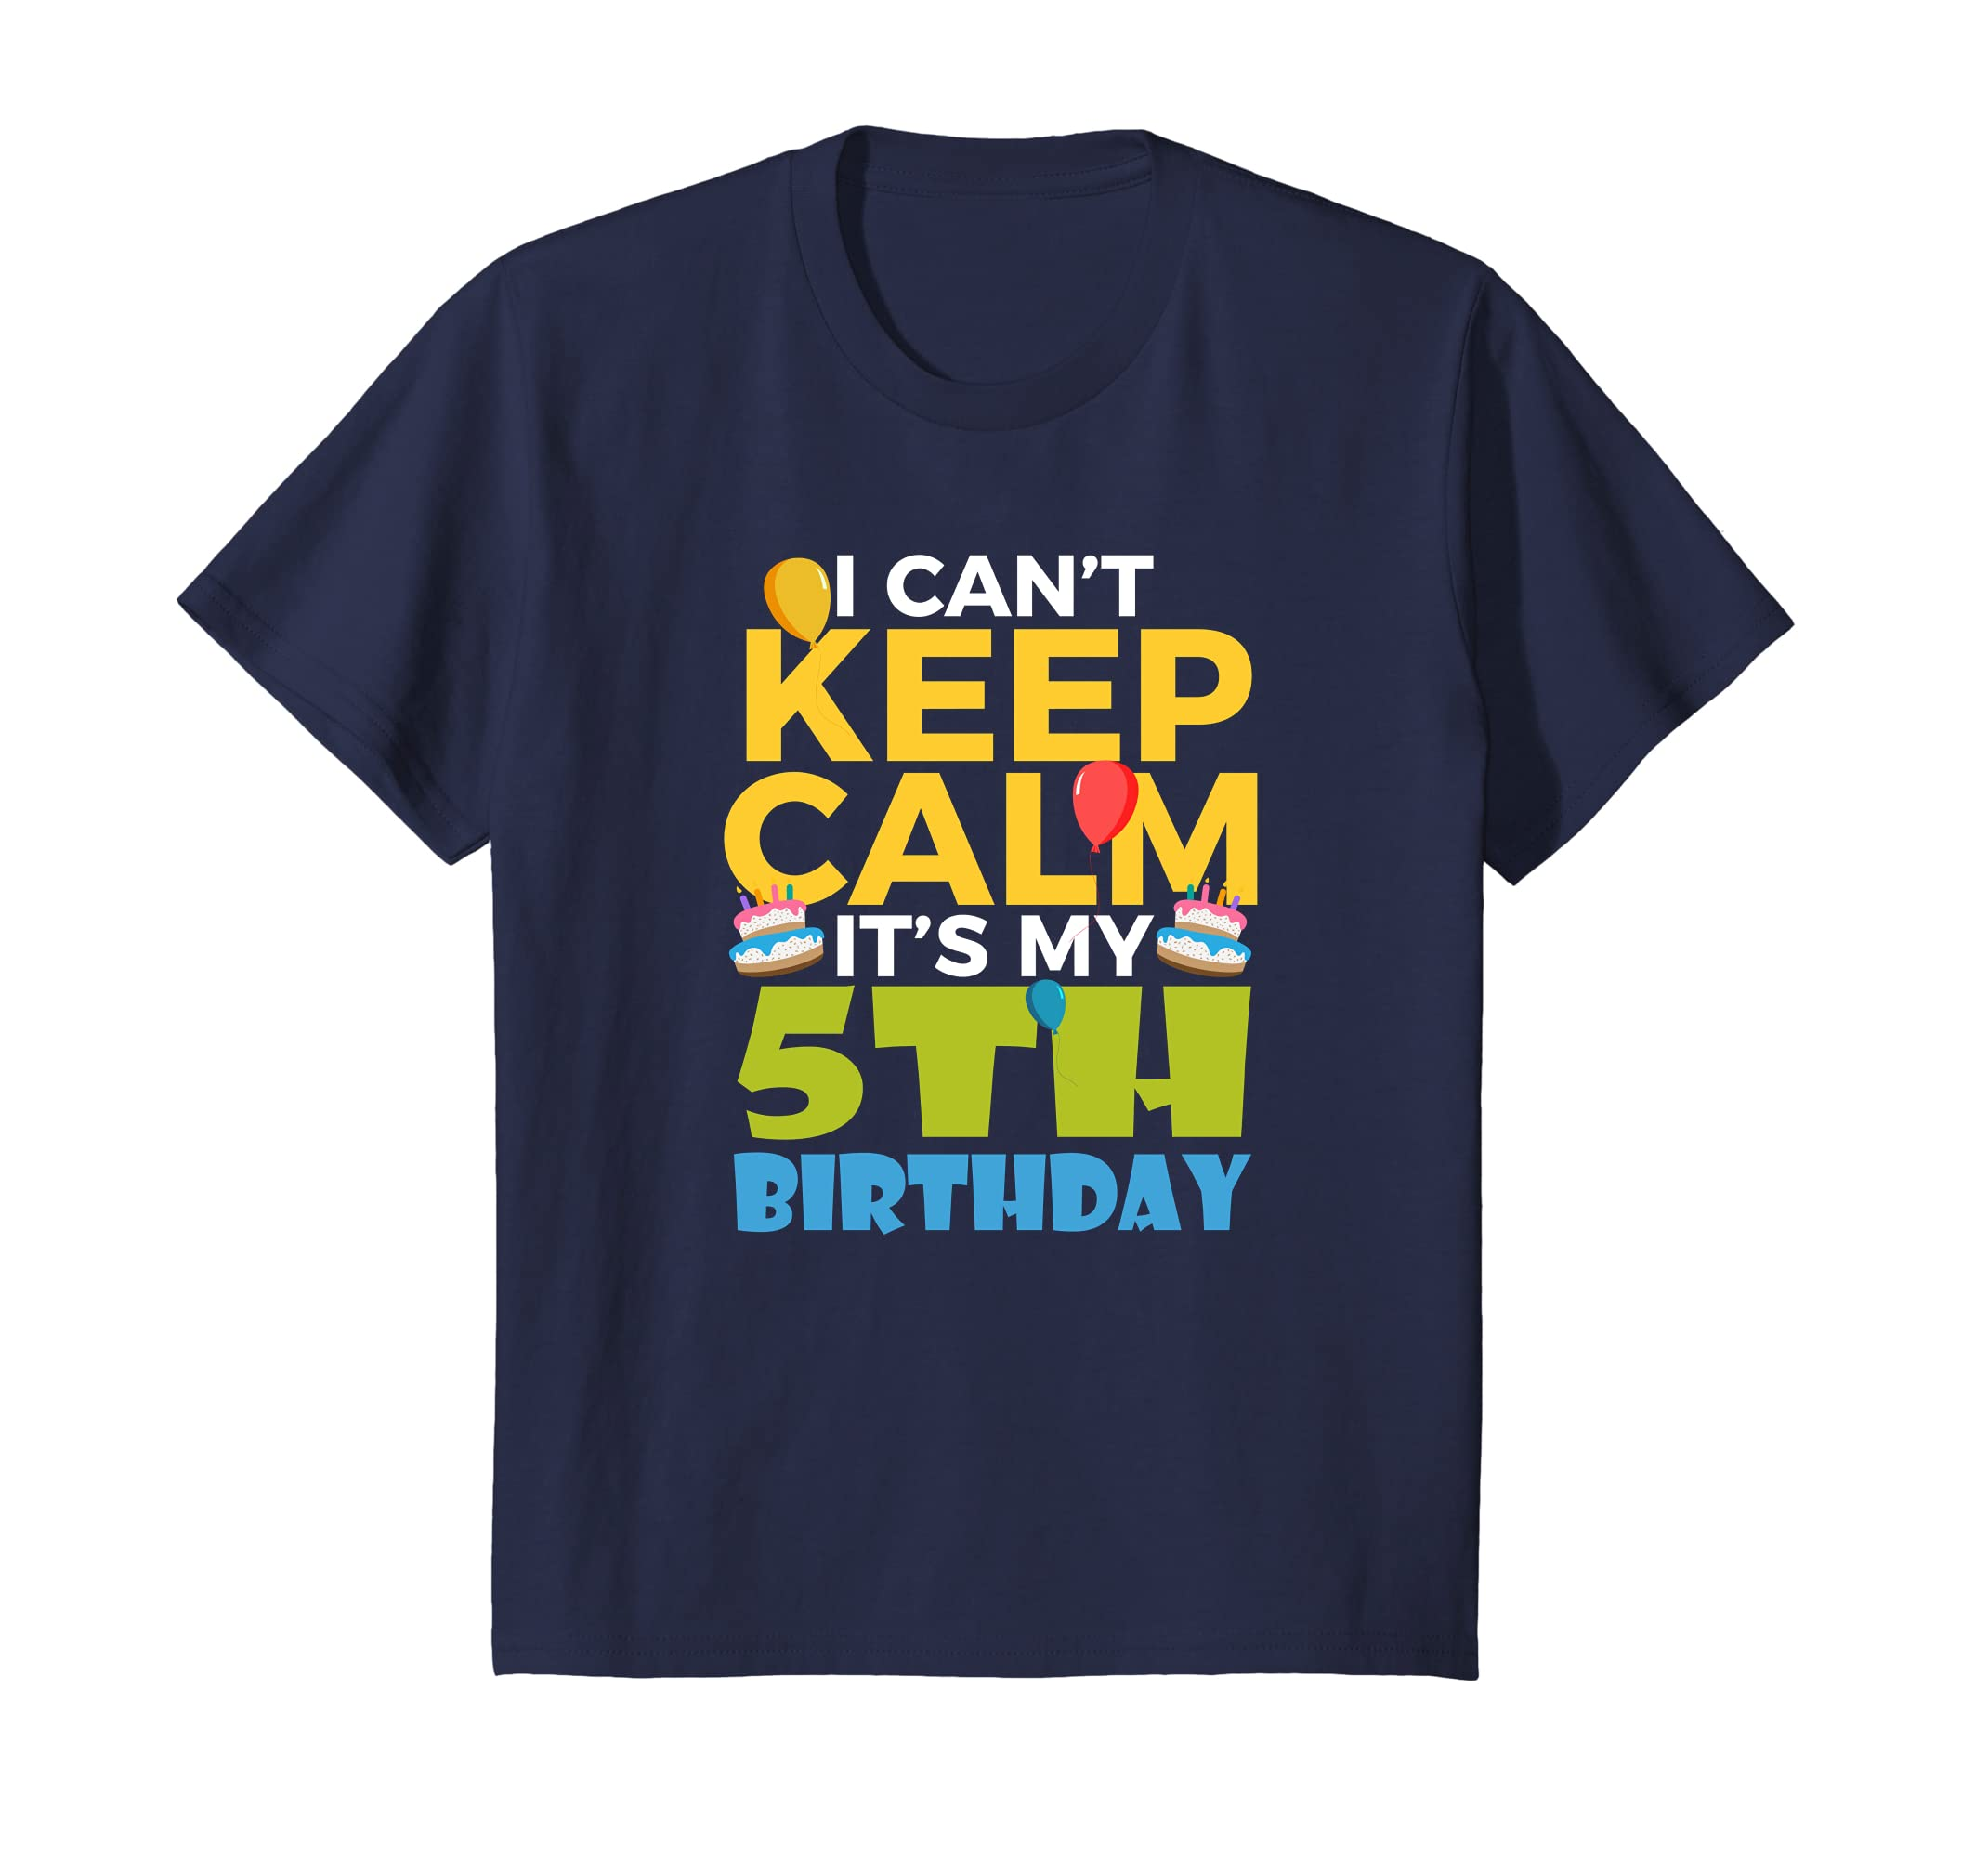 Amazon Kids 5th Birthday Shirt Boy I Cant Keep Calm Its My 5 Clothing